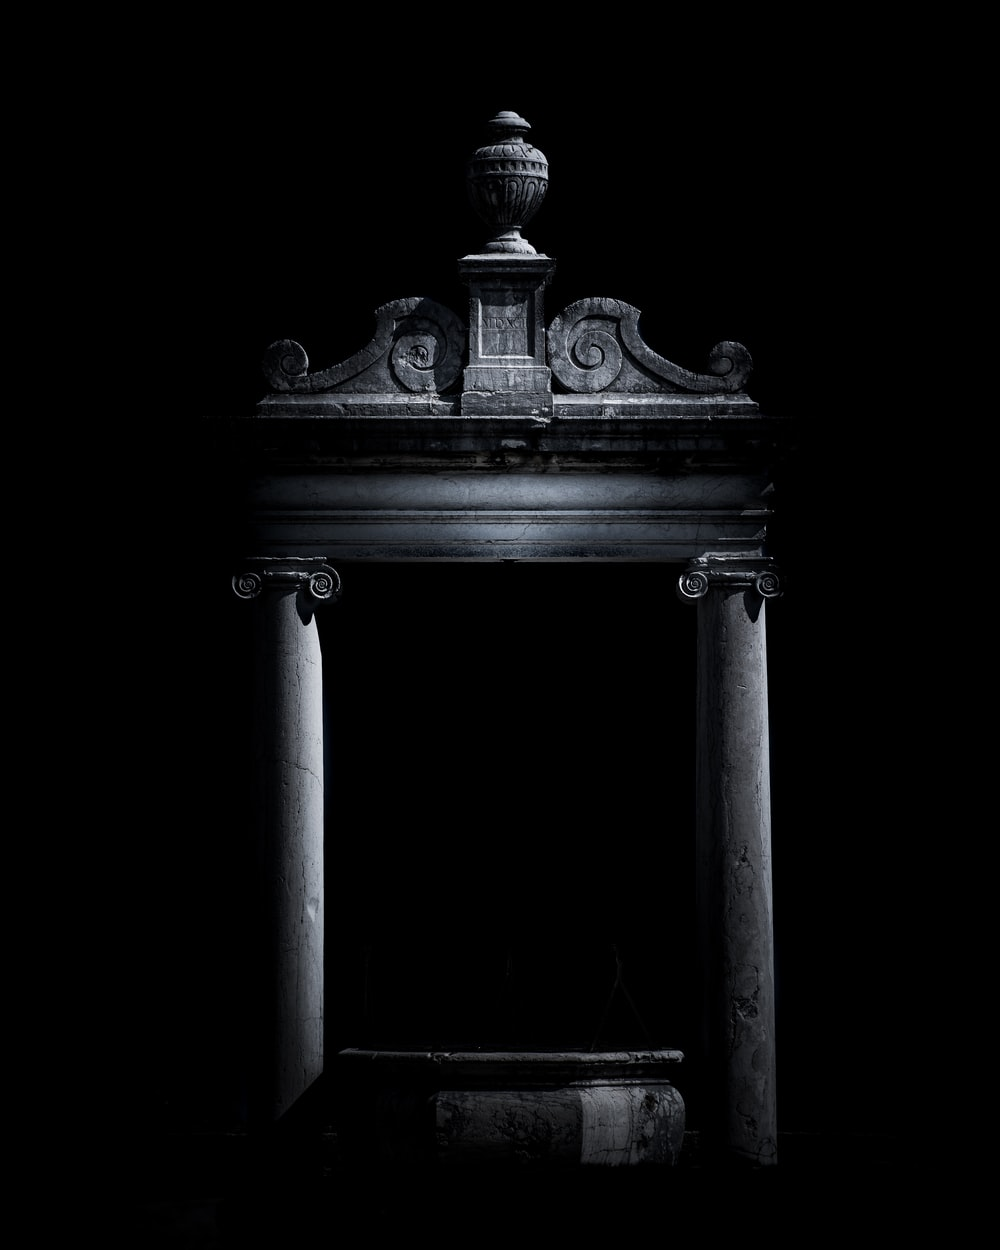 gray puja mandir altar on dark background